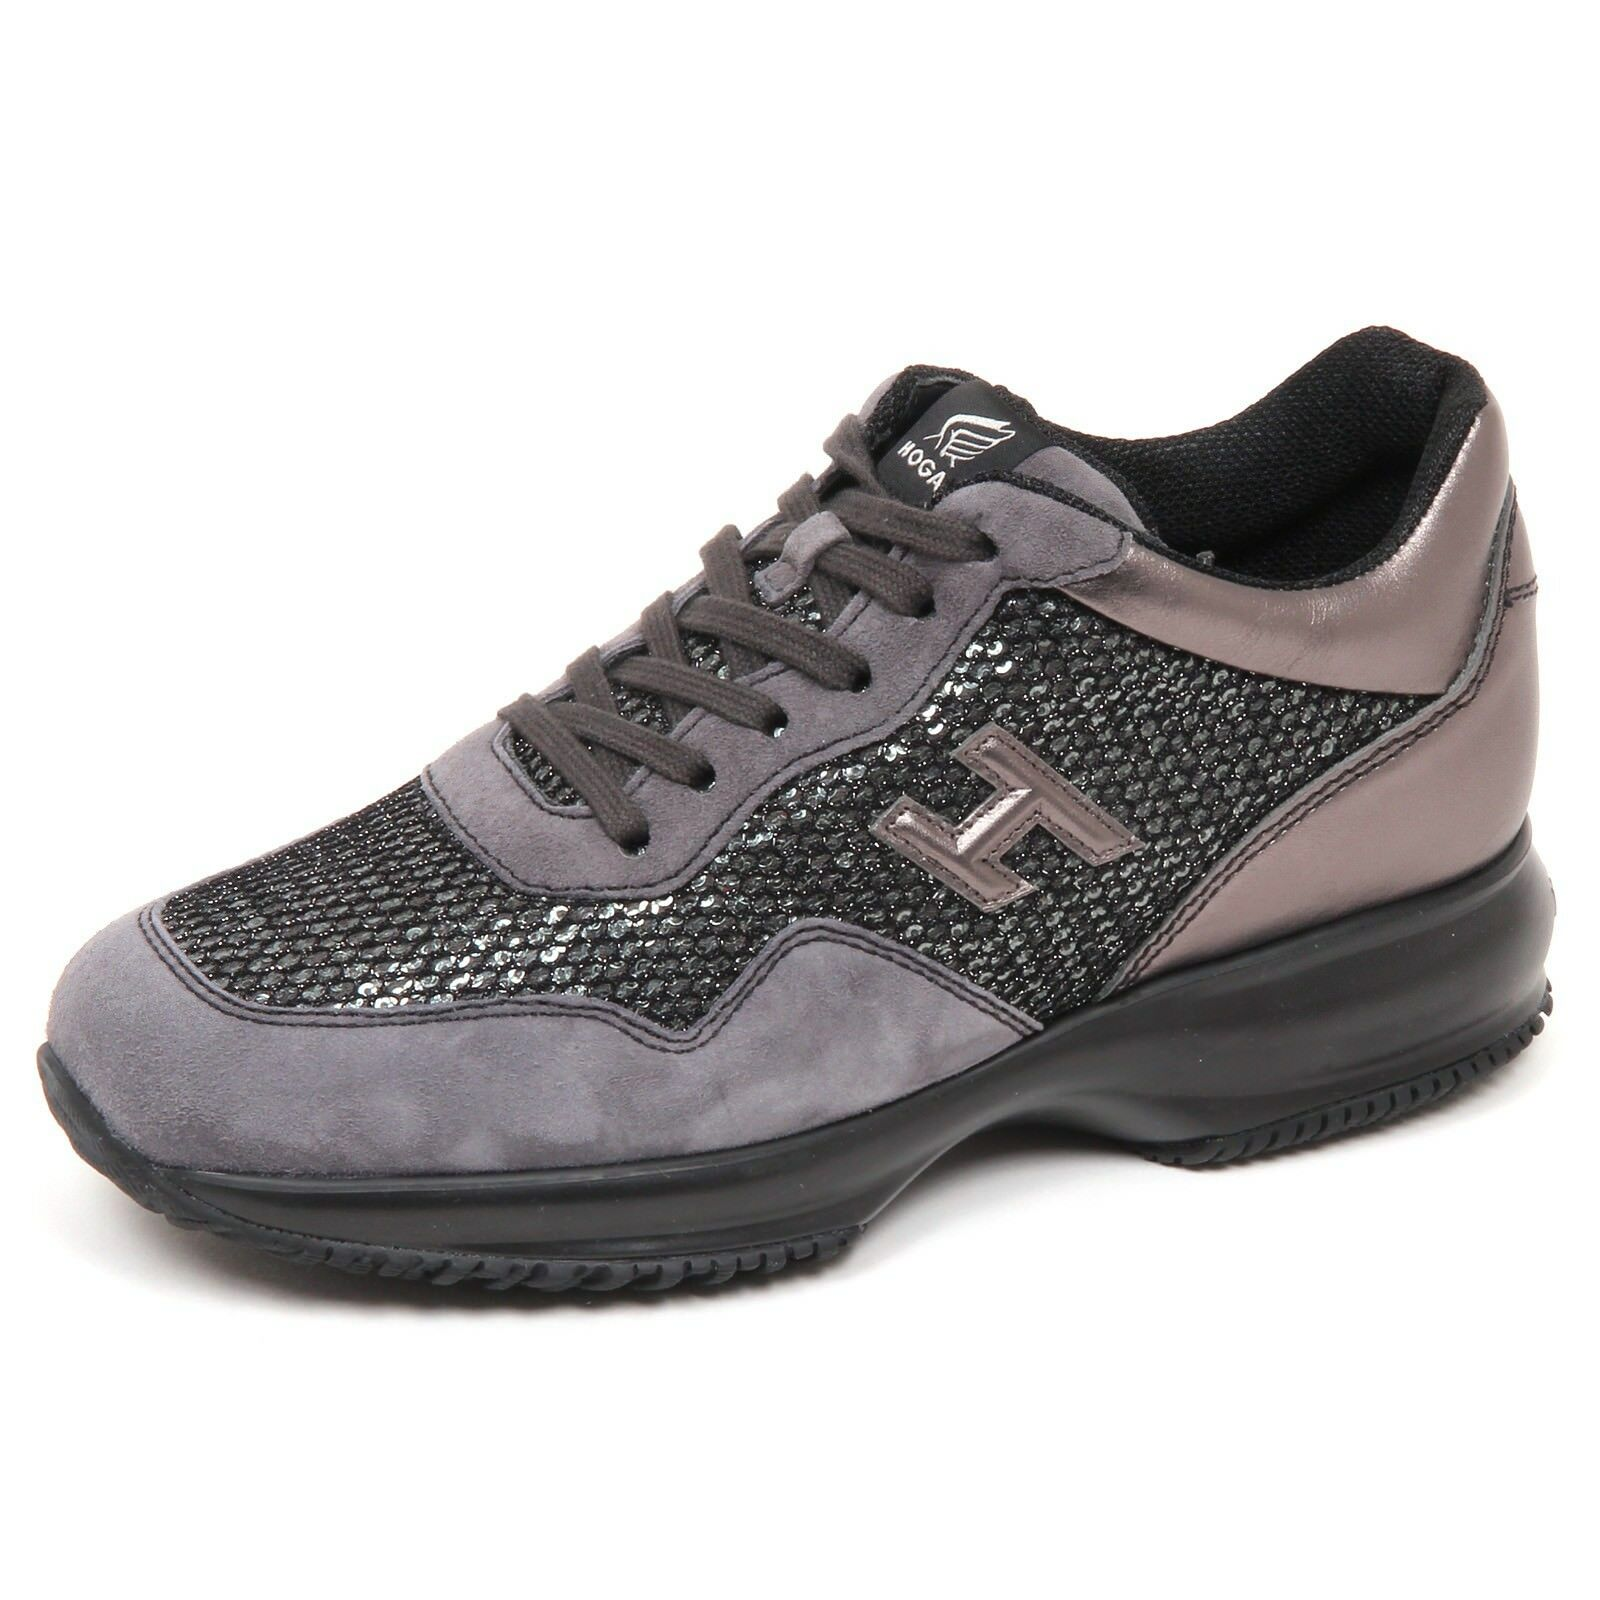 E4552 sneaker donna grey HOGAN INTERACTIVE shoe scarpe H 3D paillettes shoe INTERACTIVE woman a45643